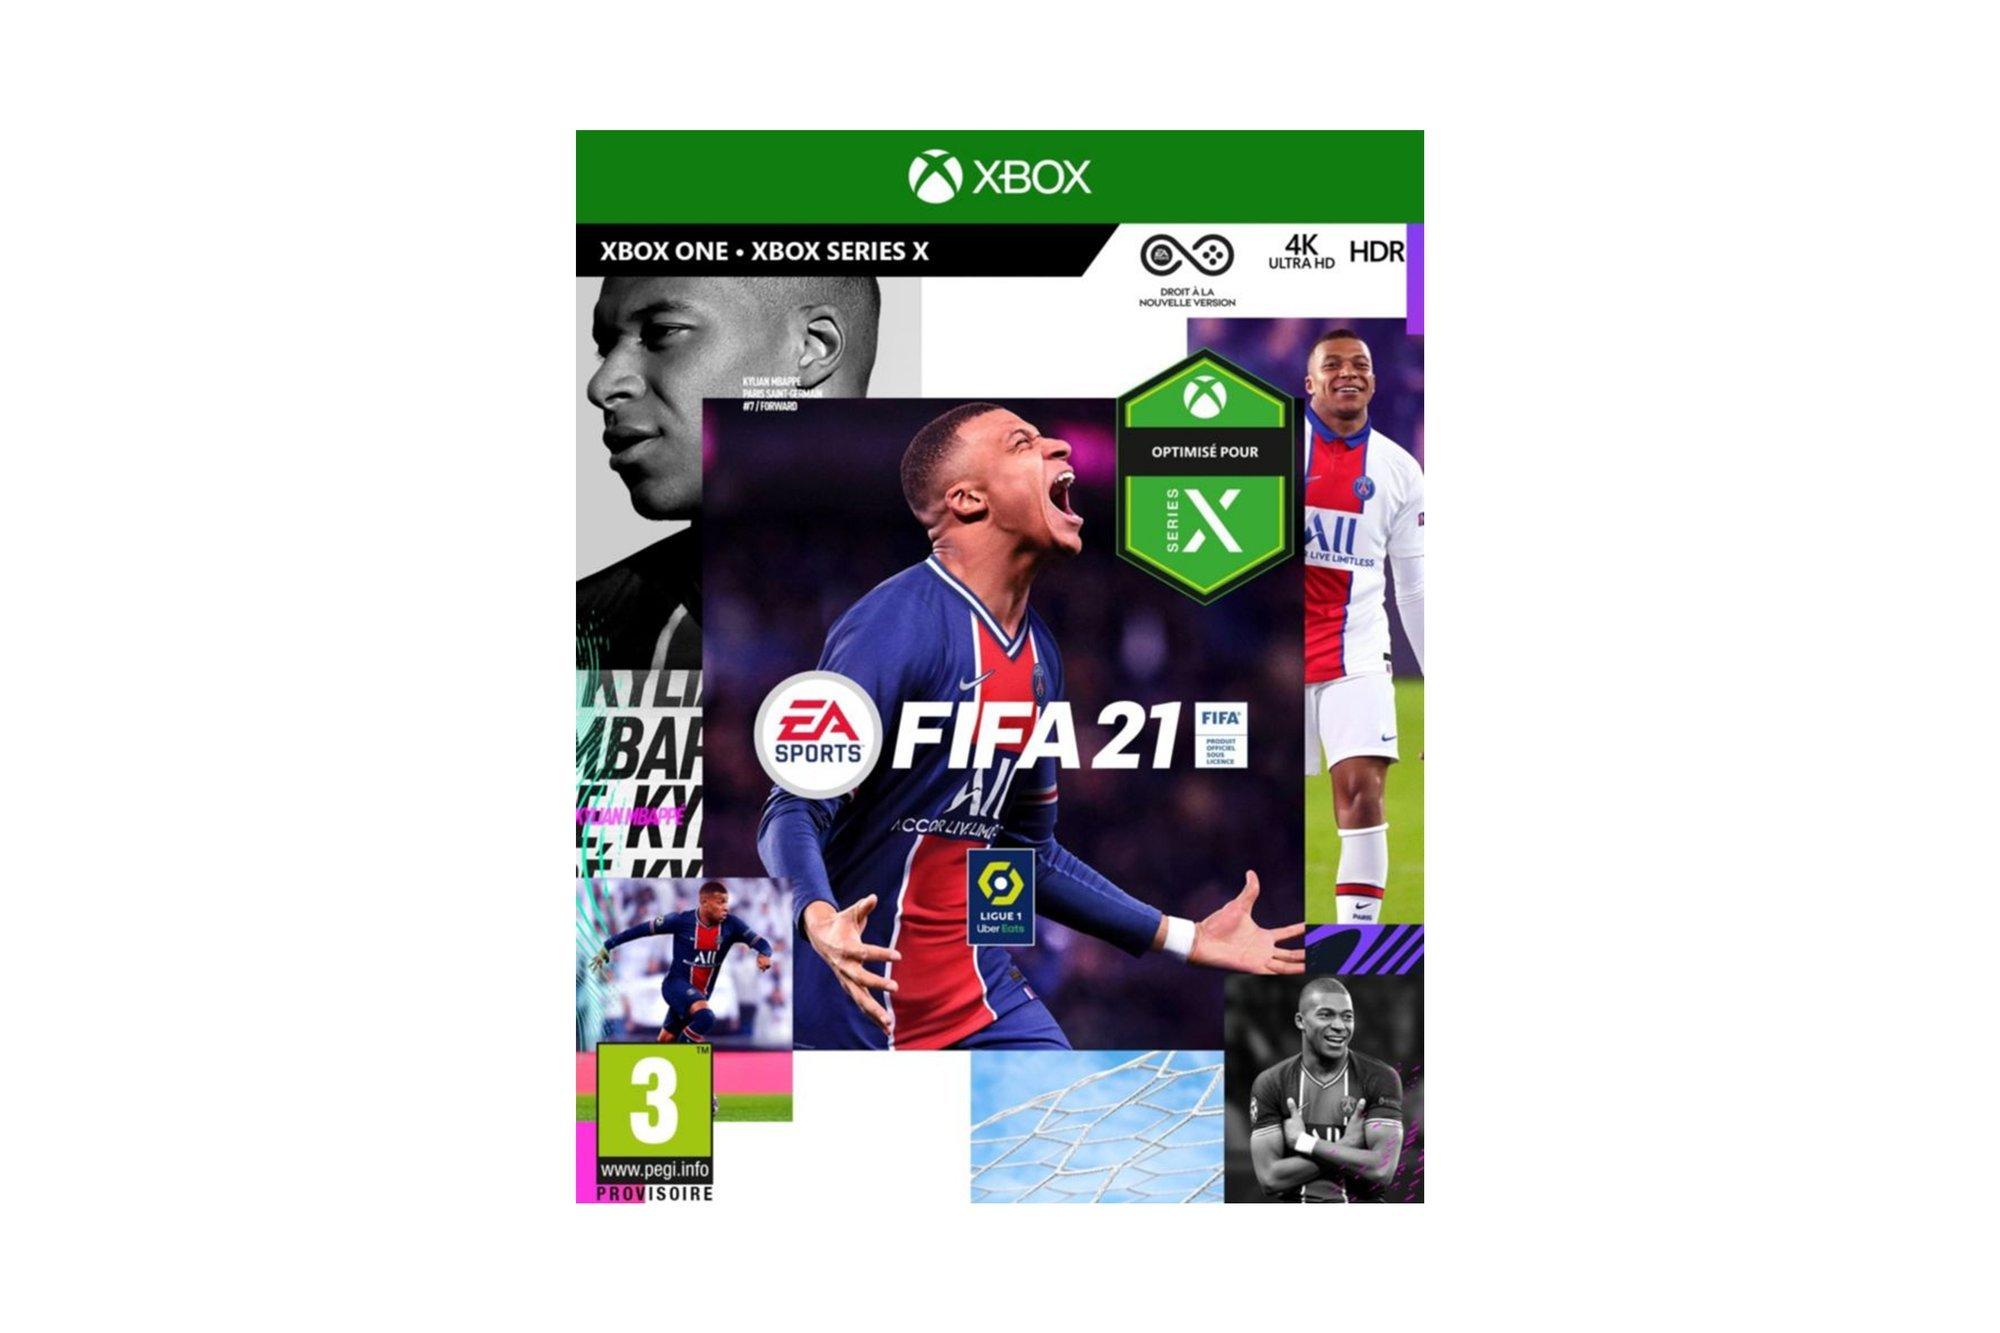 Neu OVP EA FIFA 21 - Xbox One / Series X - FIFA 2021 Box